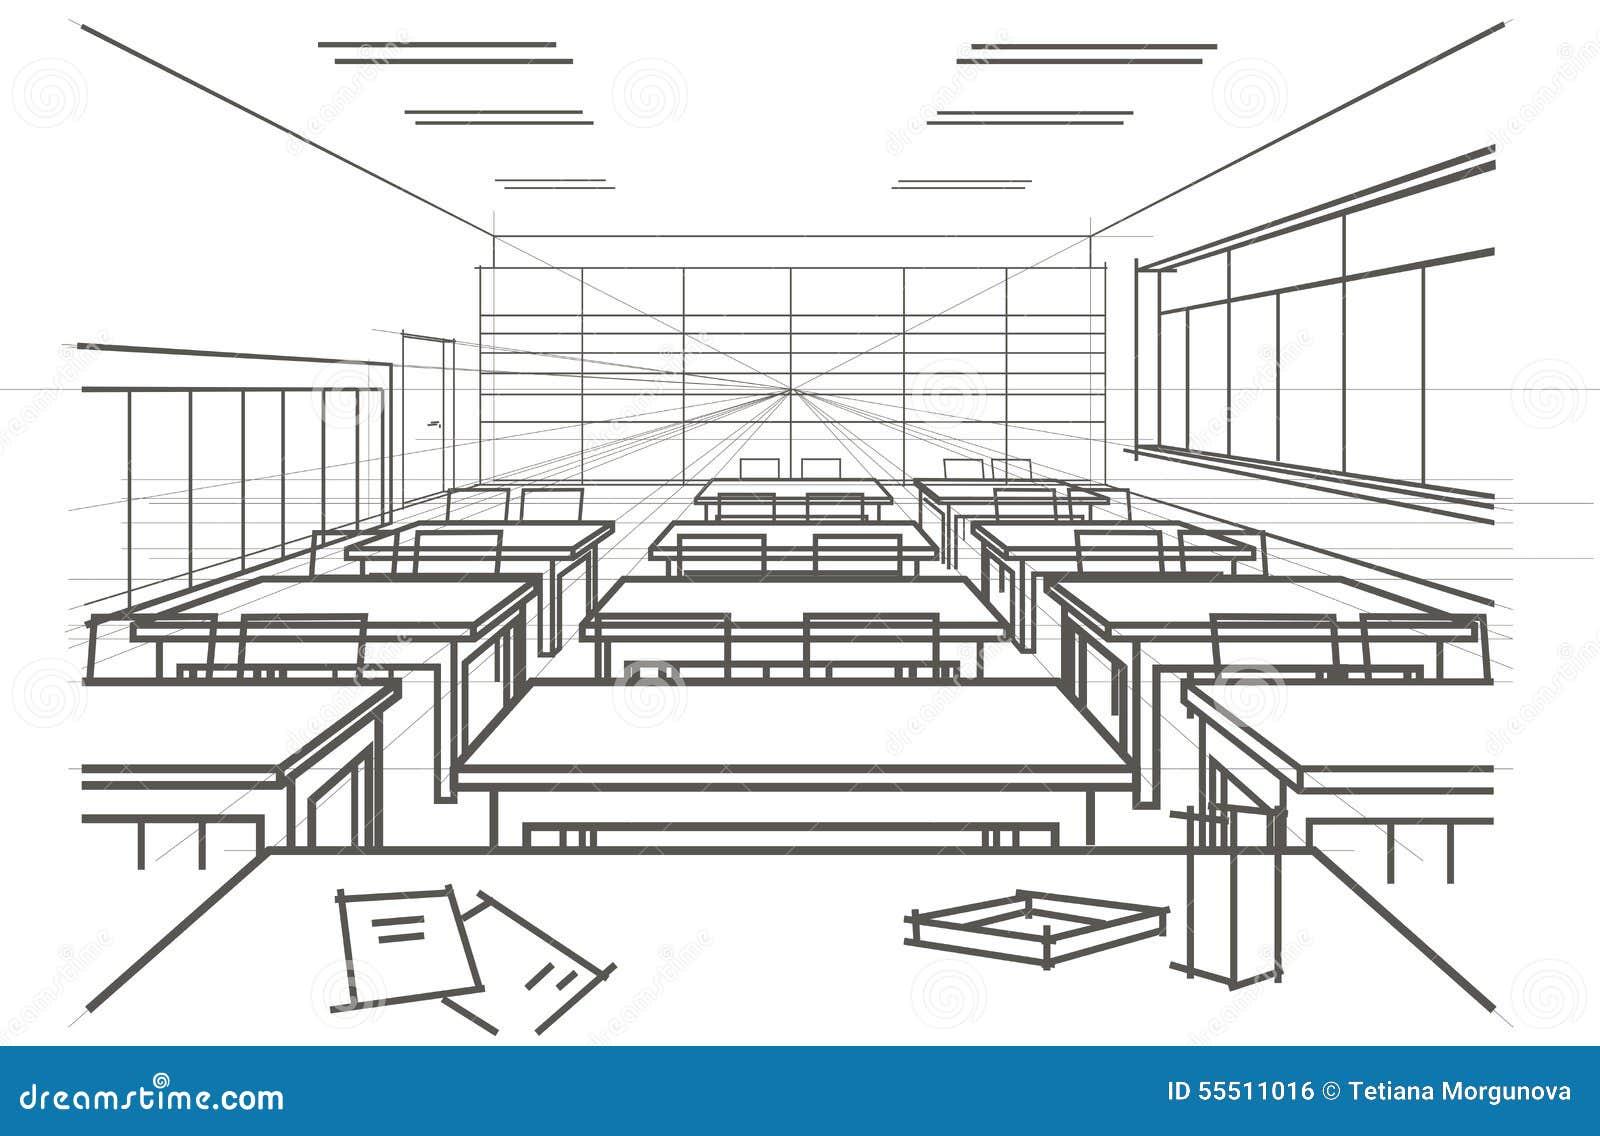 Architectural sketch interior classroom stock vector image 55511016